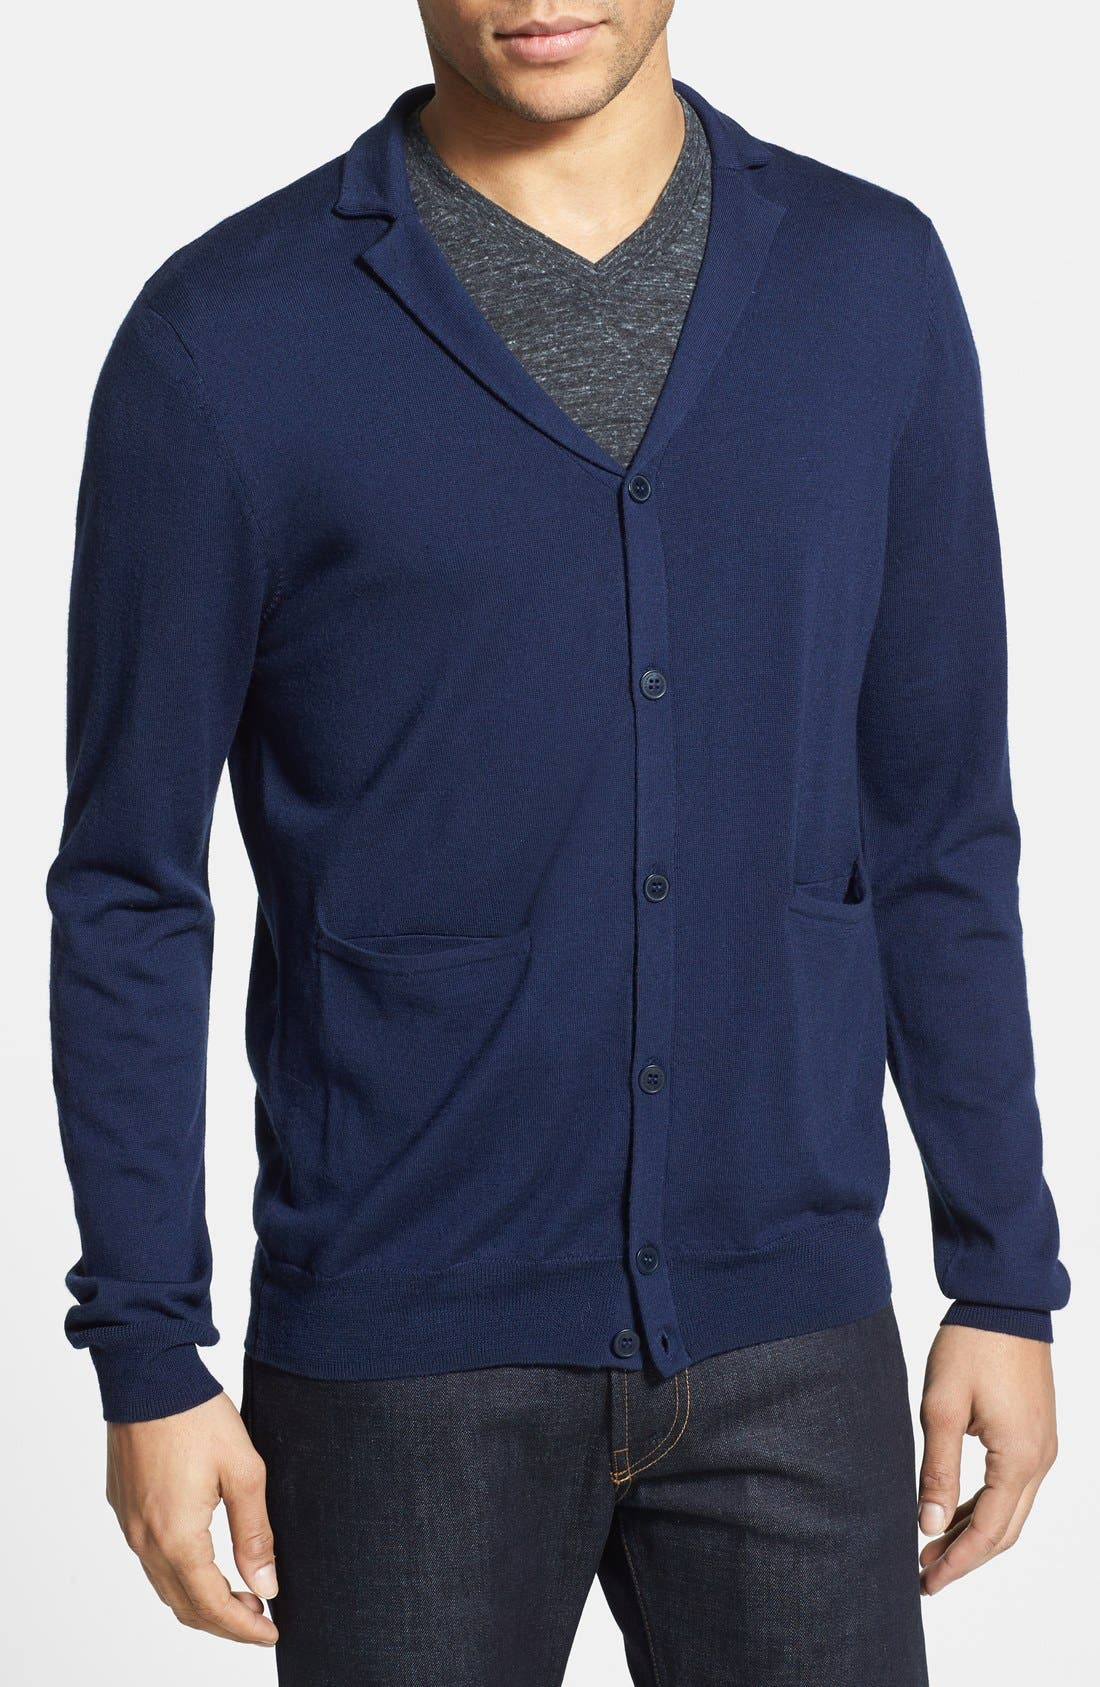 Alternate Image 1 Selected - Vince Camuto Slim Fit Merino Wool Cardigan